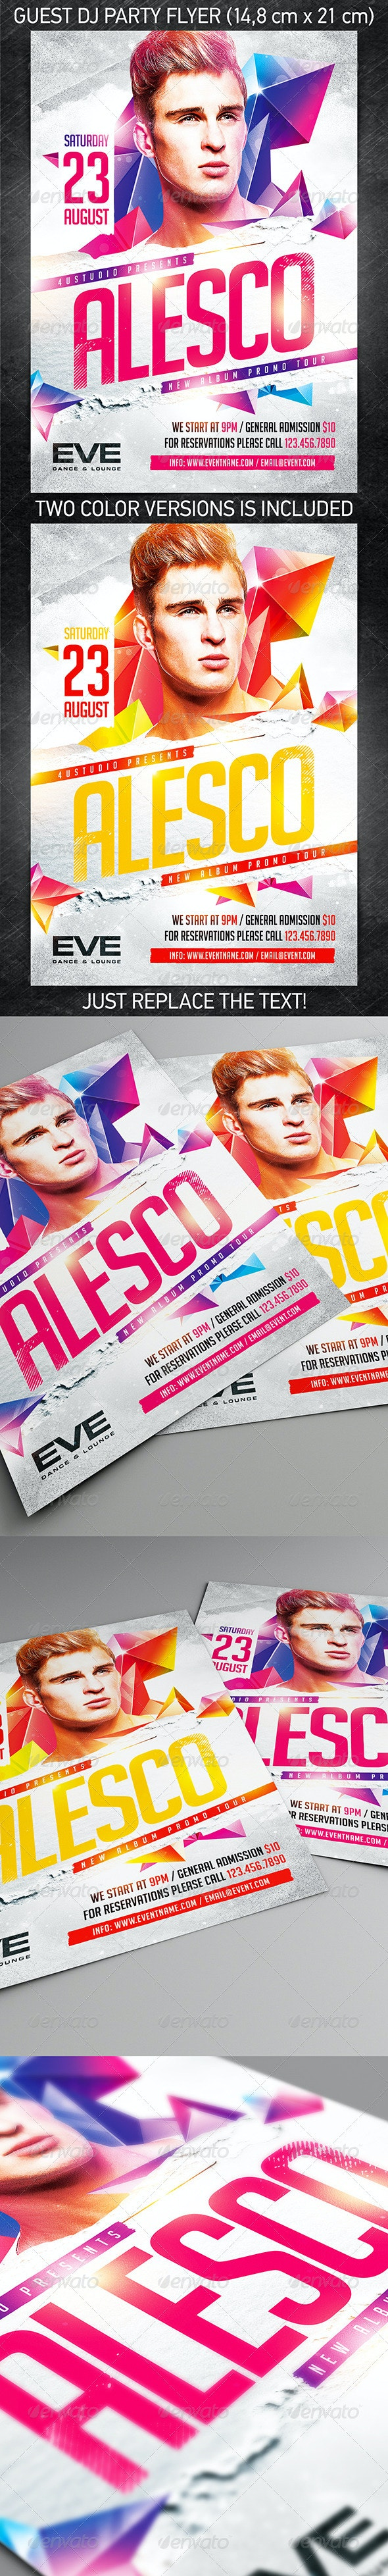 Guest DJ Party Flyer vol.5 - Clubs & Parties Events